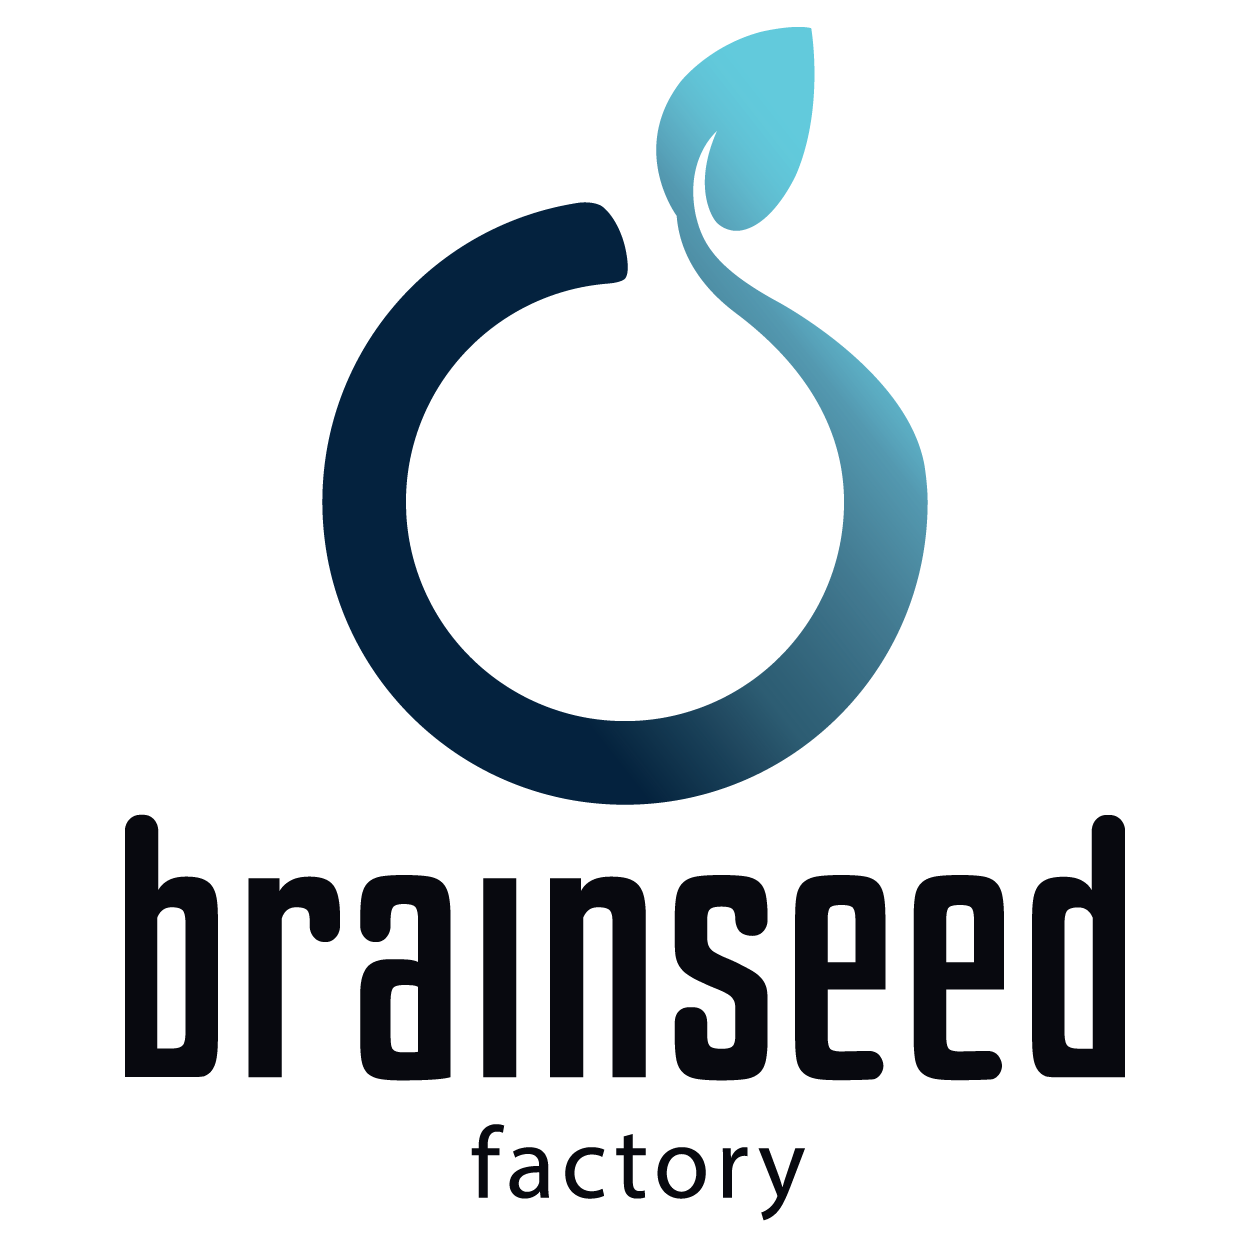 Brainseed Factory